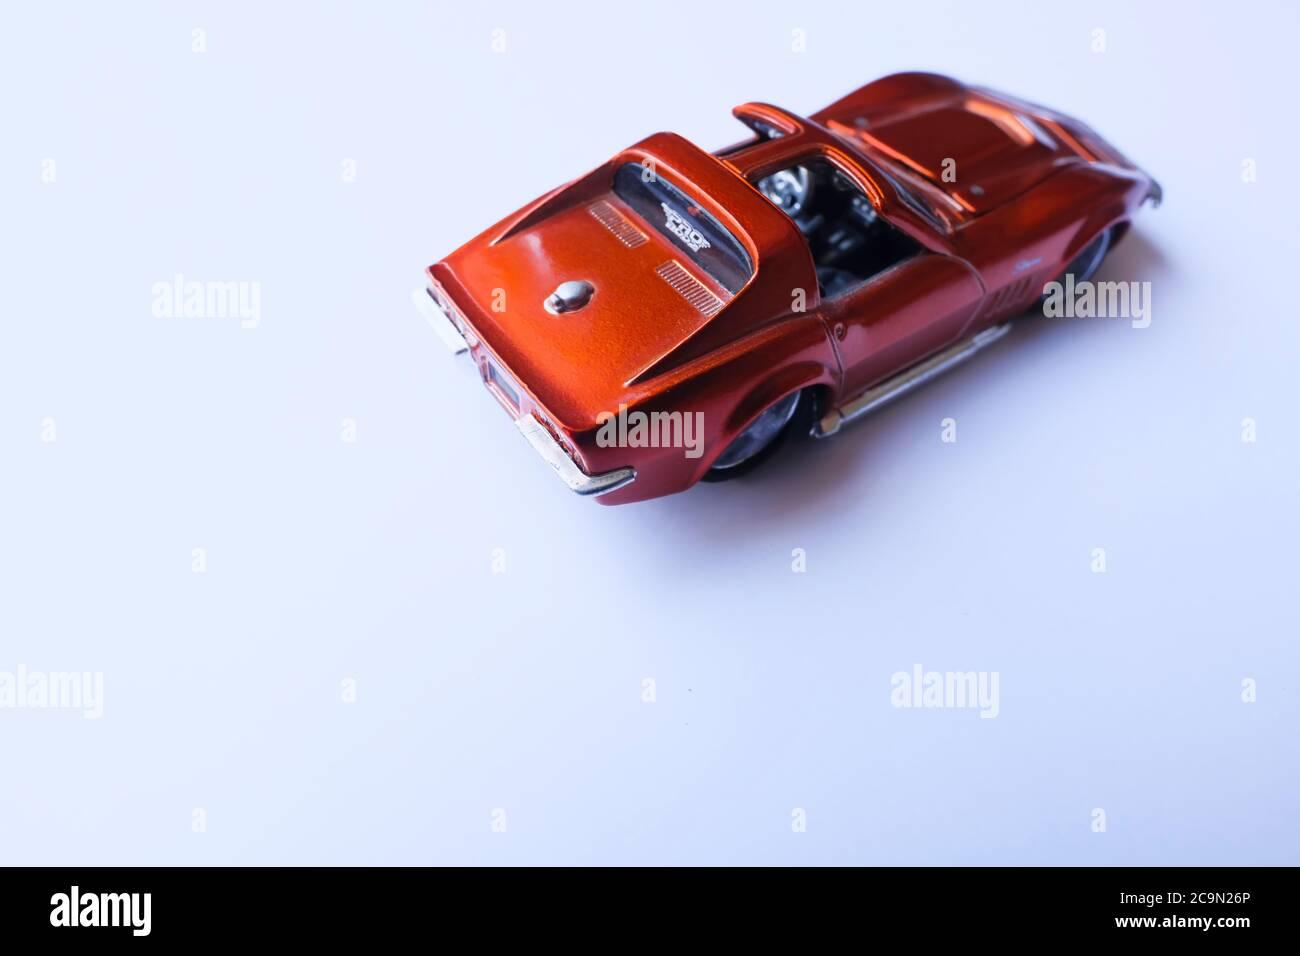 Istanbul, Turkey - July 29, 2020 : Maisto pro rodz 1 64 scale orange 1969 Corvette Stingray die cast toy car on white background from rear view. Stock Photo